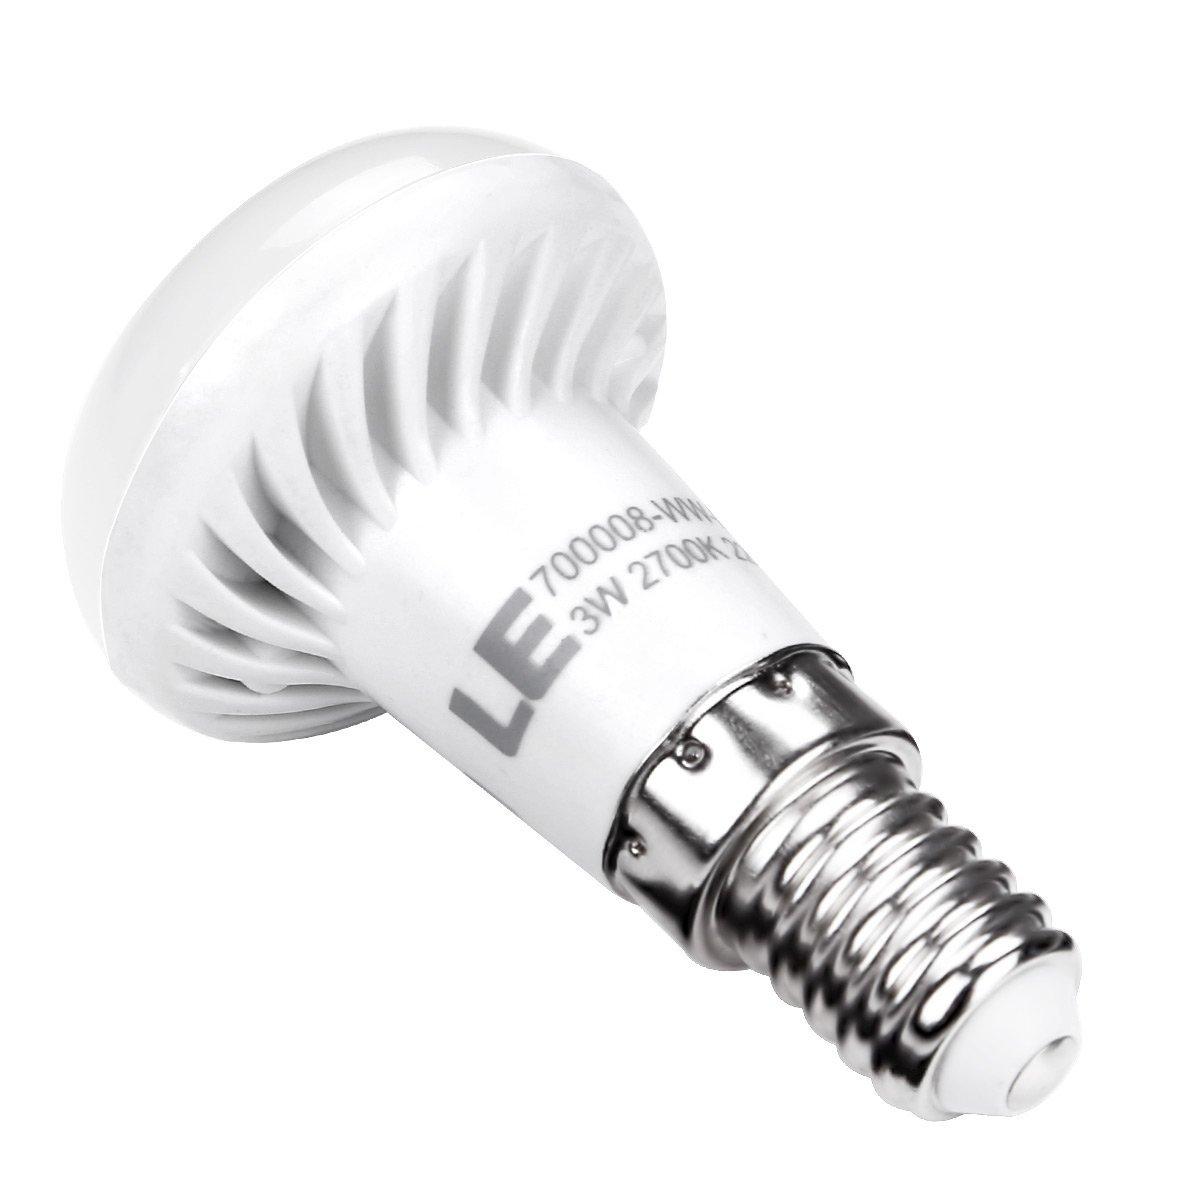 3W LED Reflektor R39, 250lm E14 Birnen, SES Lampen, ersetzt 25W Glühlampe, Warmweiß